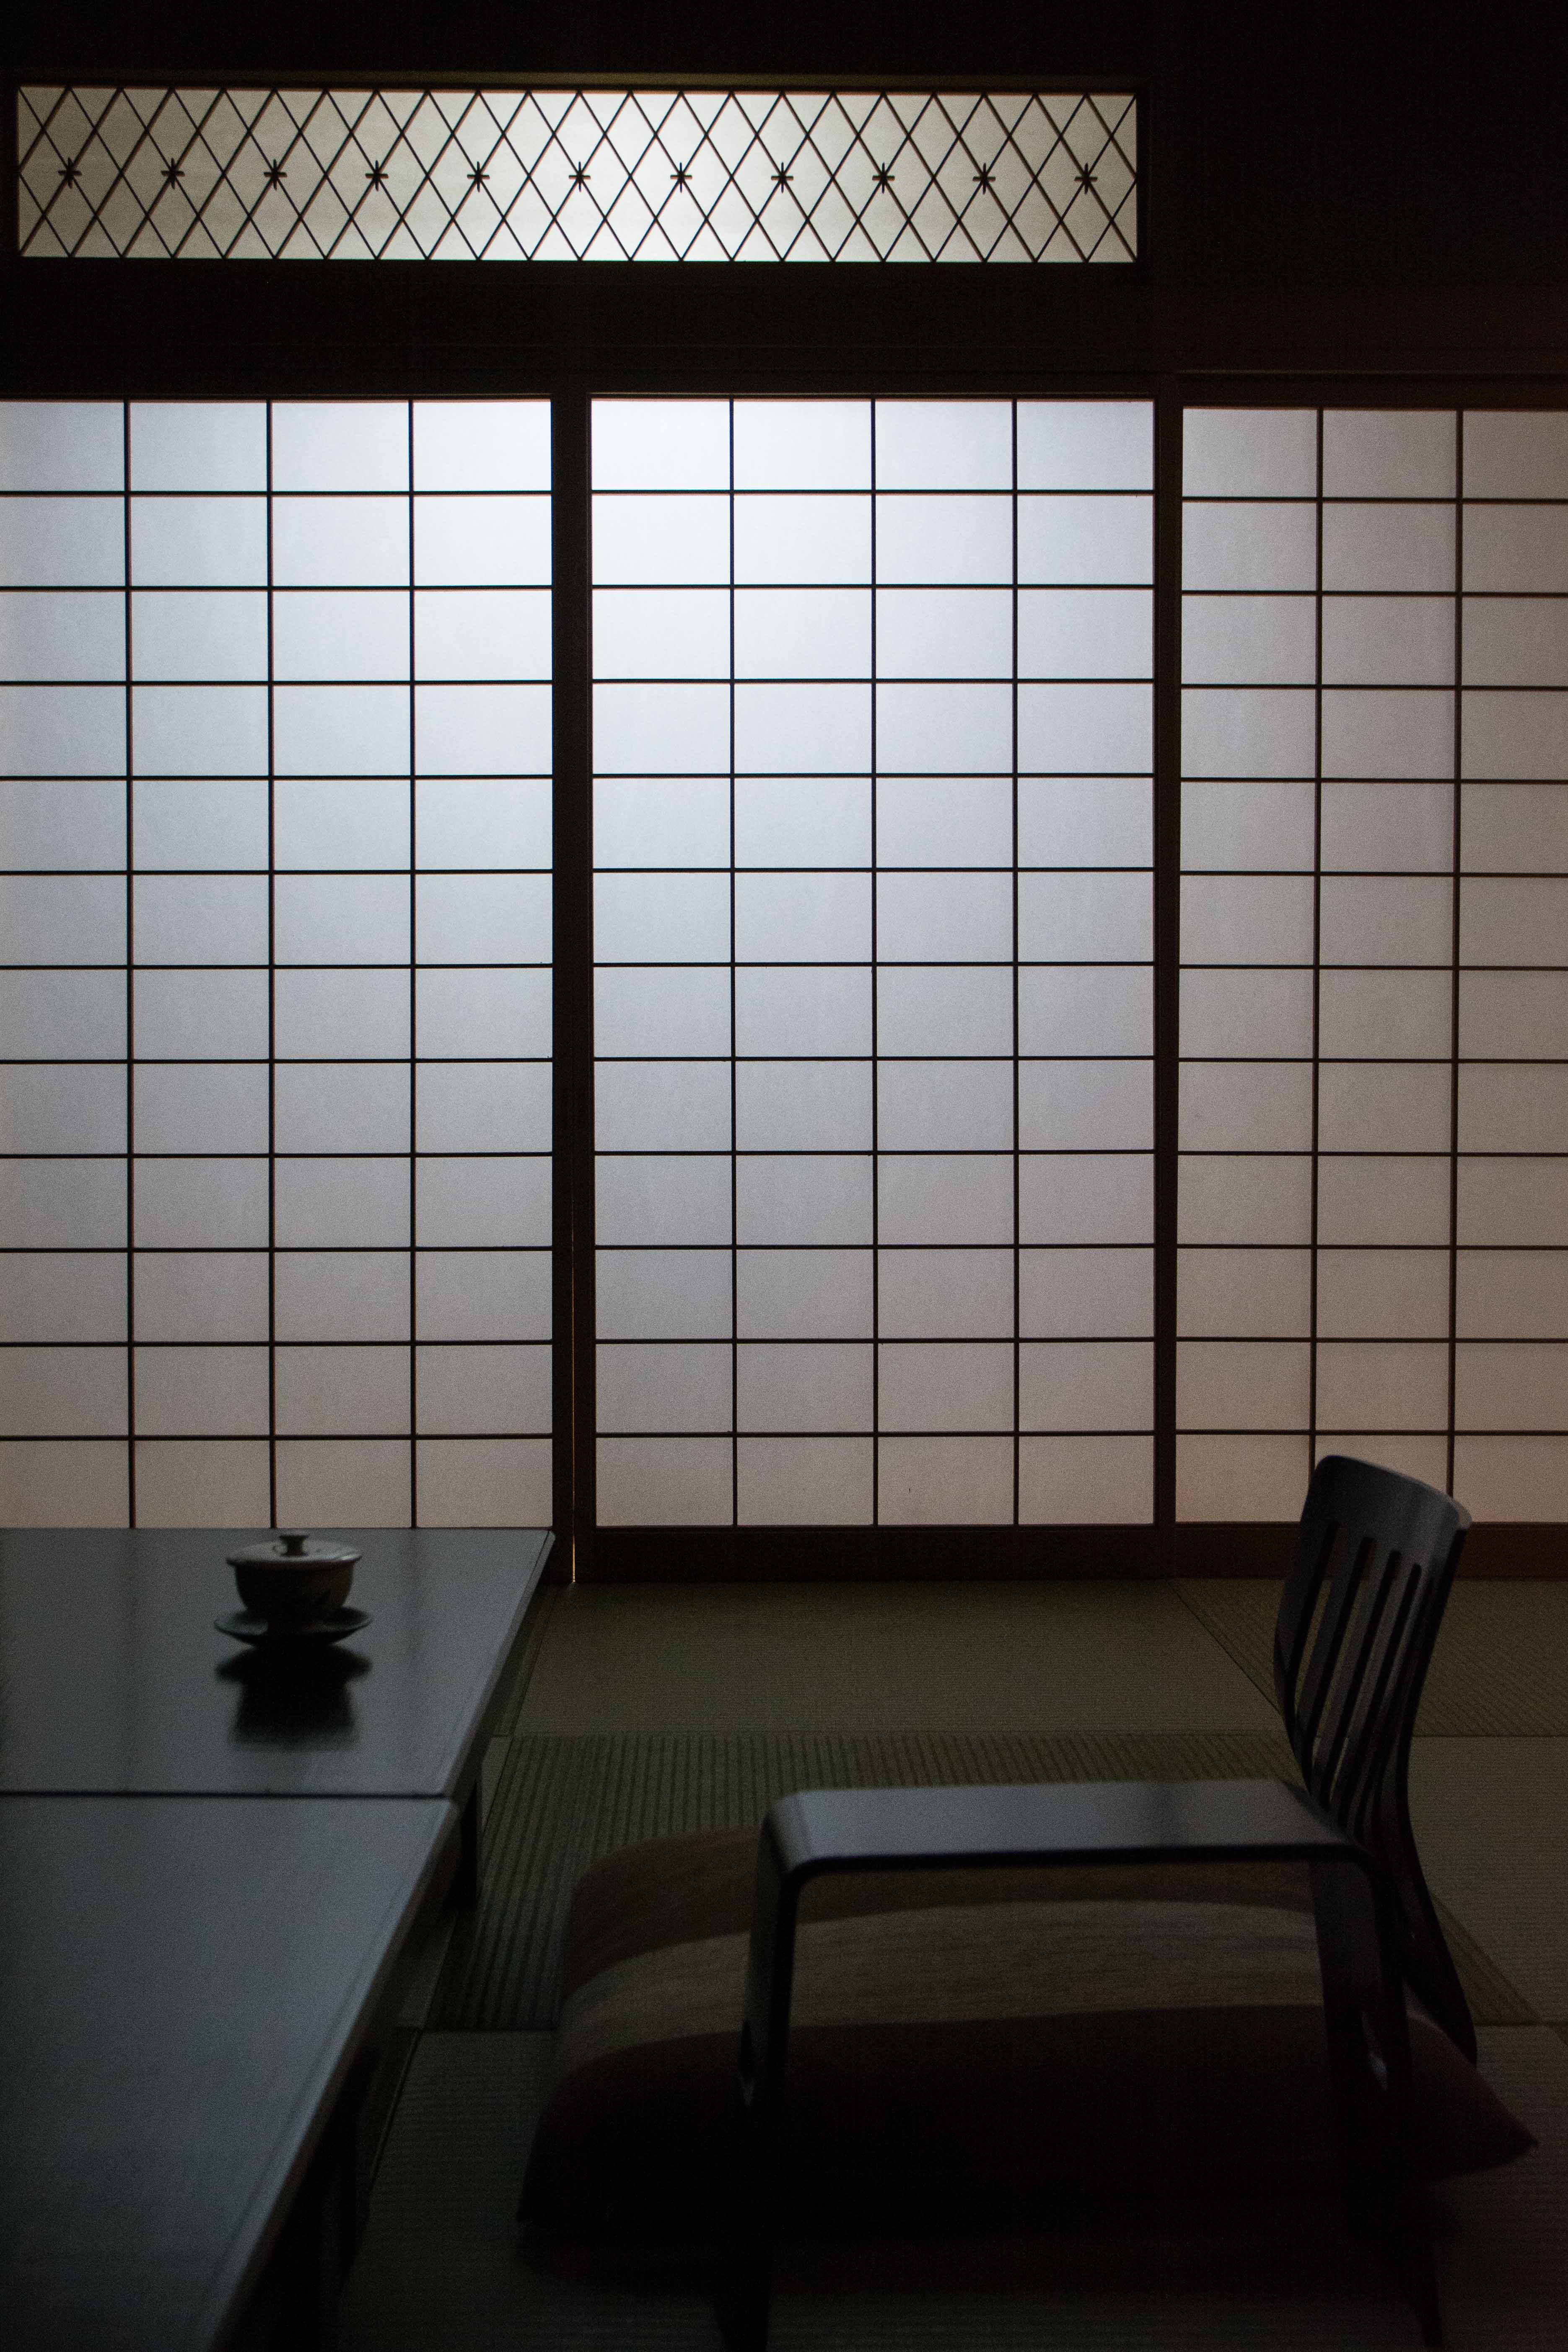 Matsuya Sensen, un joli ryokan, herbergement traditionel japonais à Awara Onsen dans la prefecture de Fukui au Japon